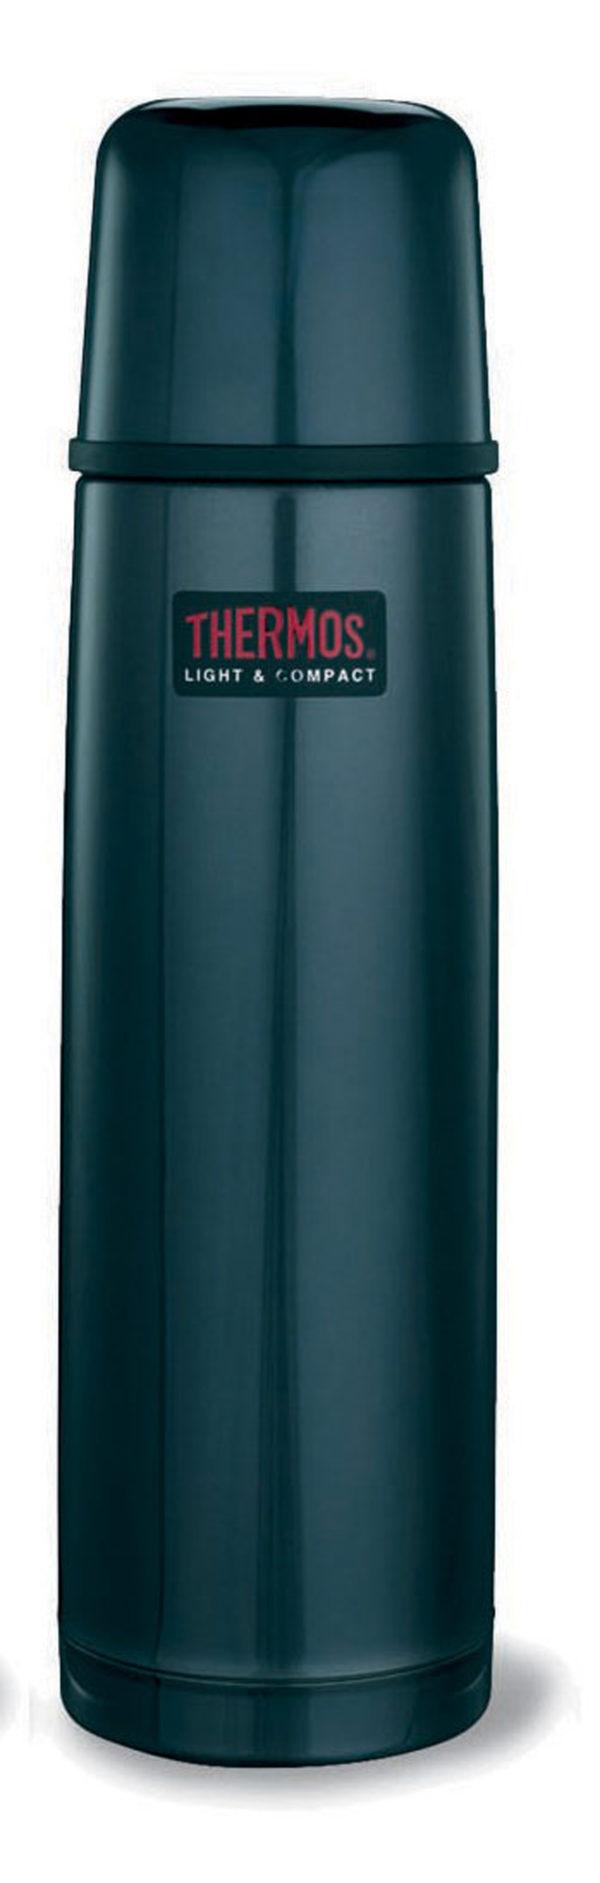 Thermos Fbb750 ml Midnight blue